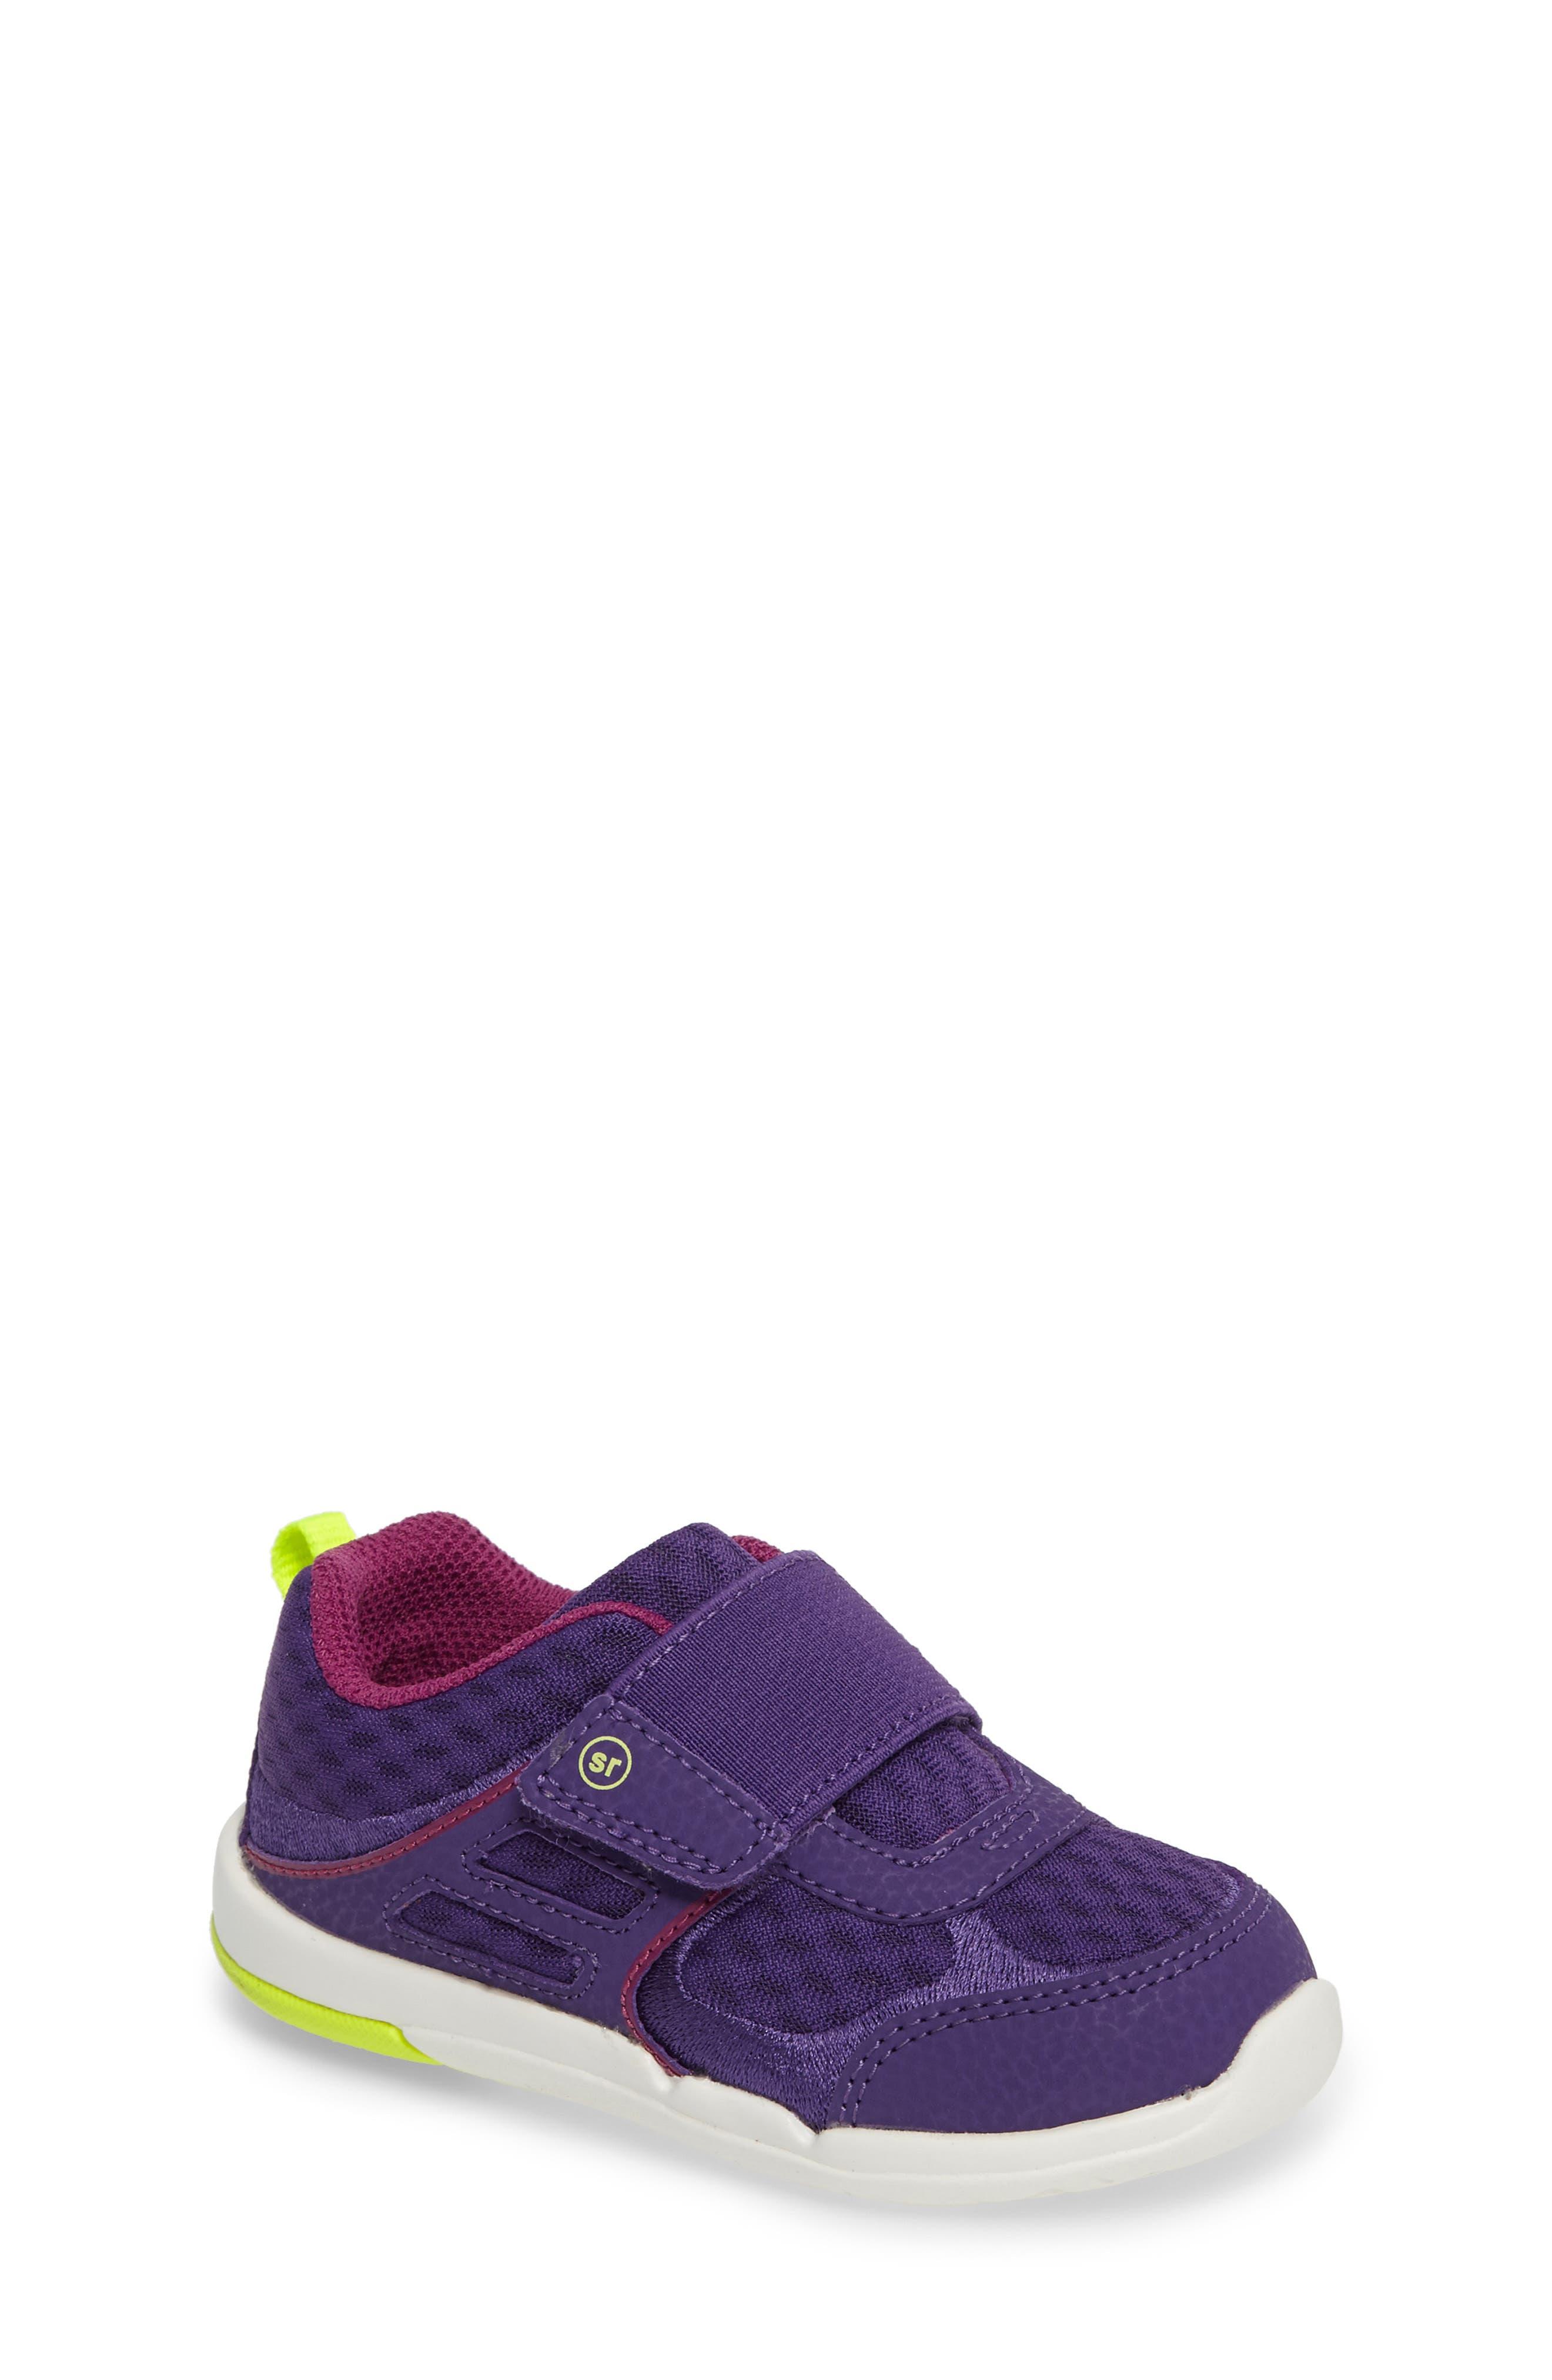 Casey Sneaker,                             Main thumbnail 1, color,                             Purple